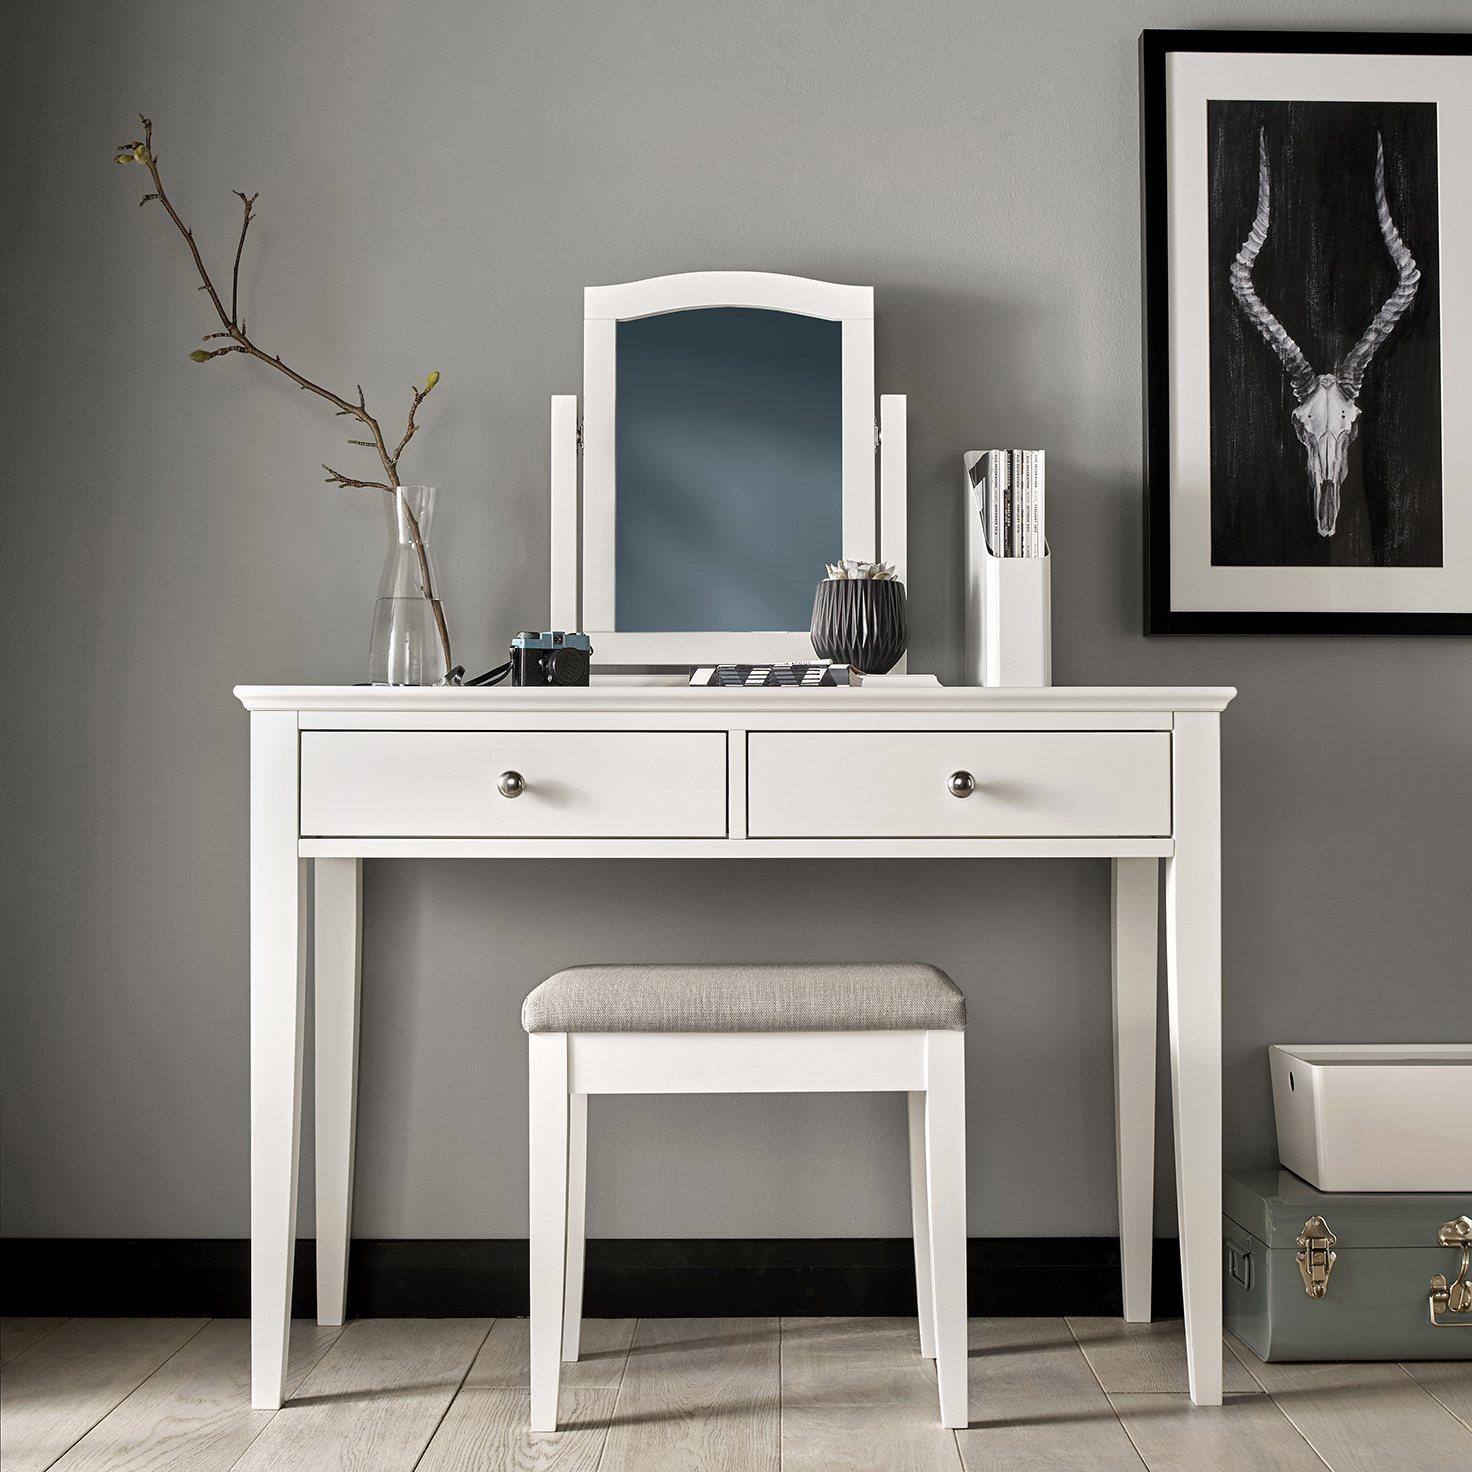 ASHLEY (GREY or WHITE) DRESSING TABLE - L109cm x D47cm x H78cm